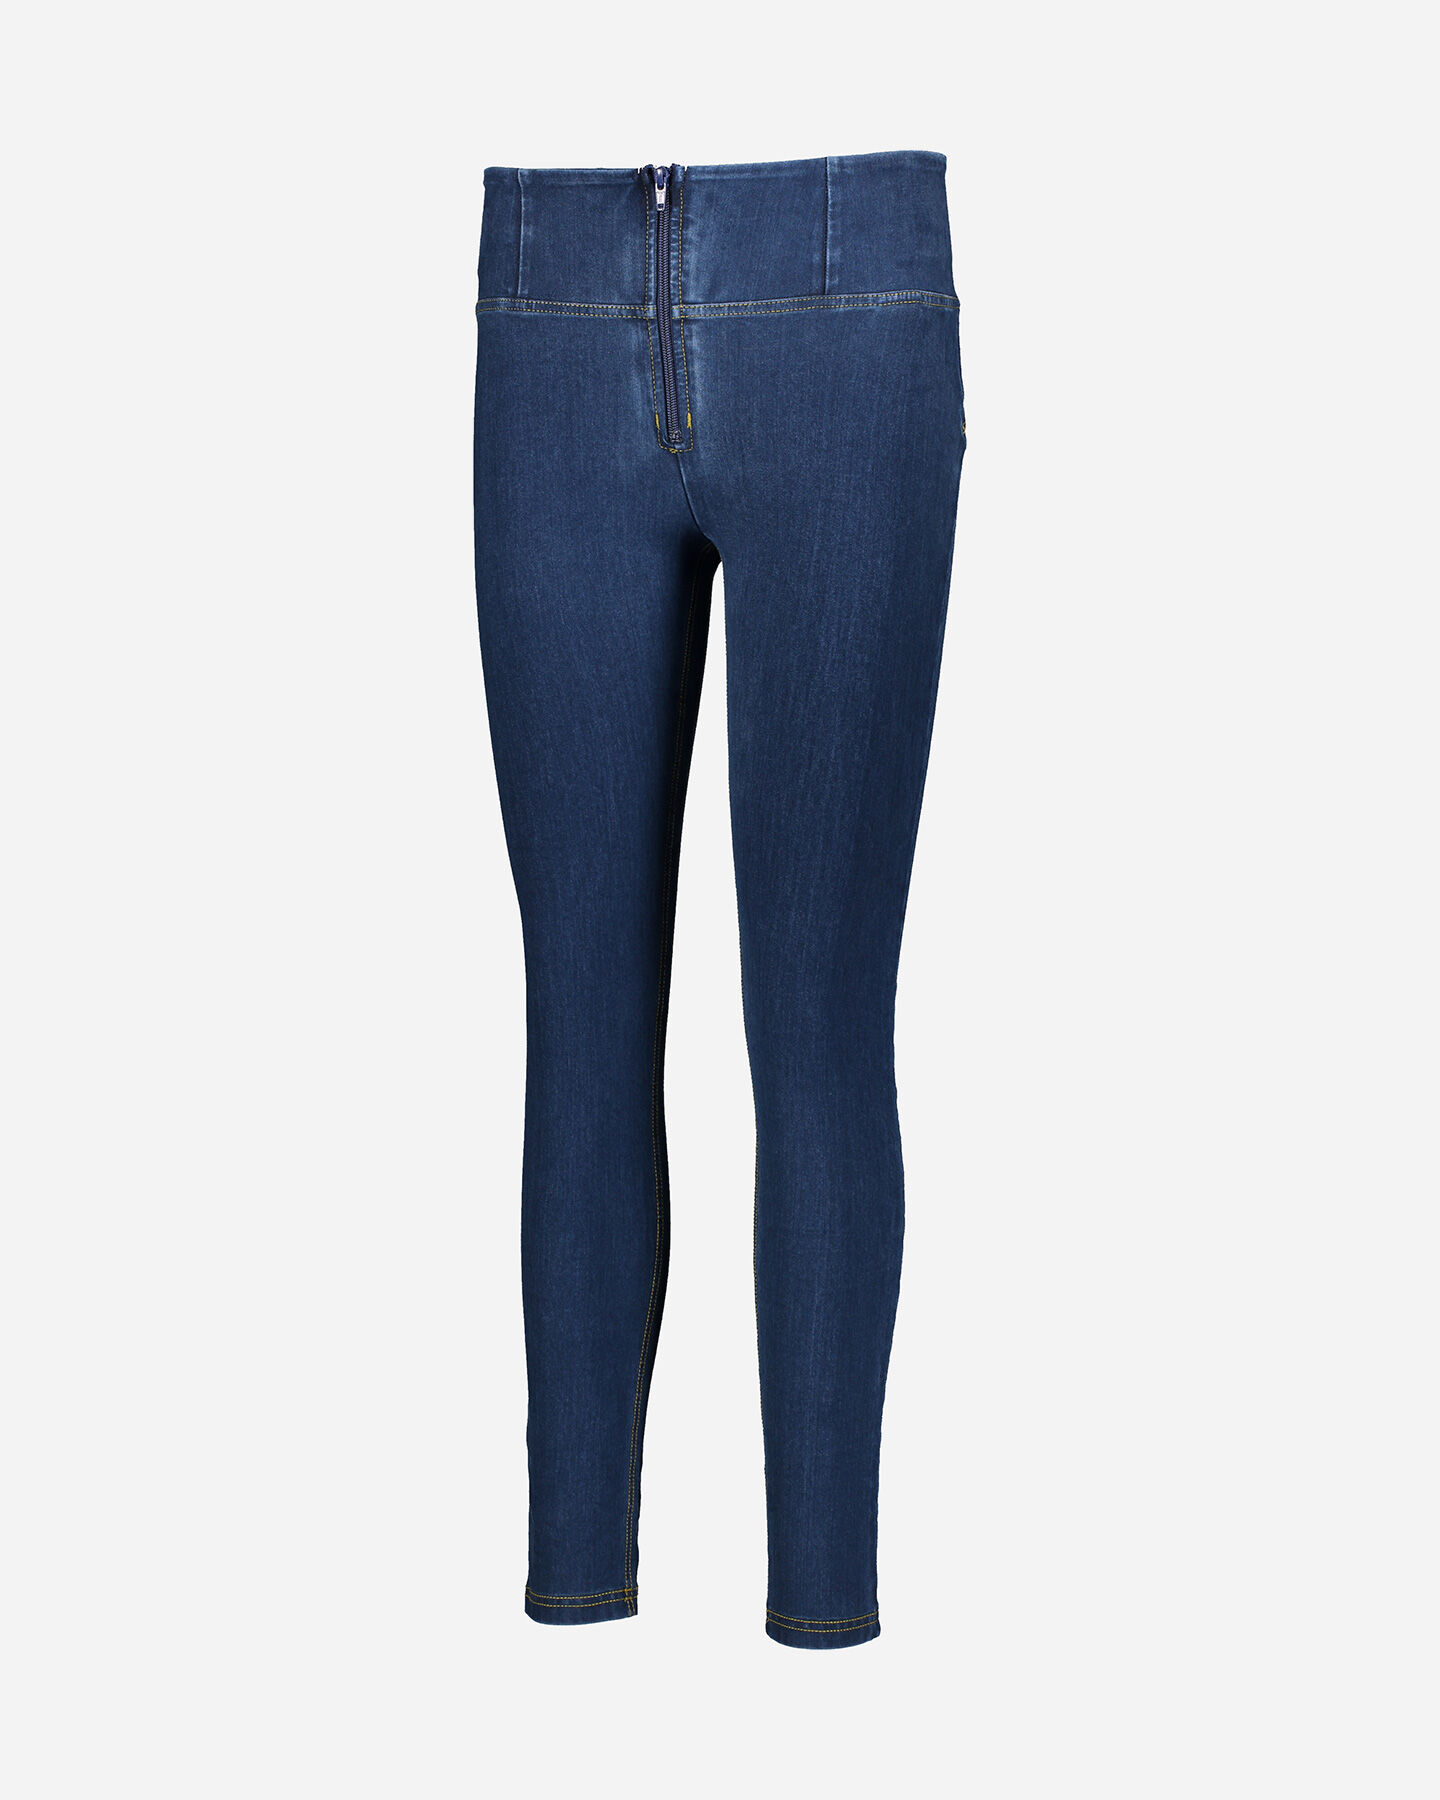 Pantalone FREDDY HIGH WAIST NOW WRUP W S5222756 scatto 0